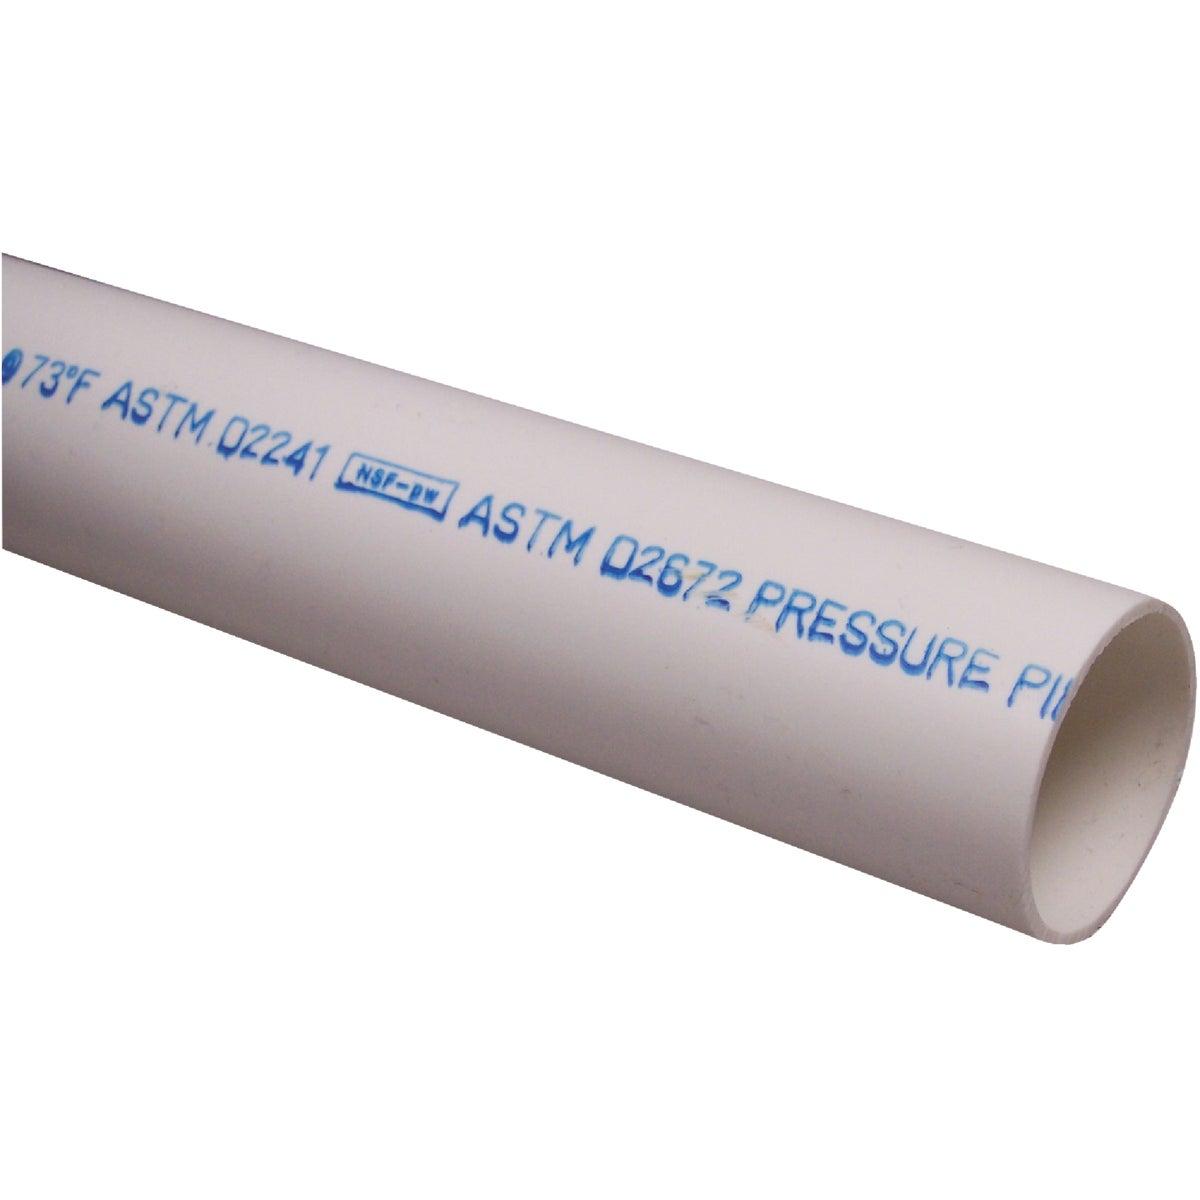 1-1/4X2 SDR 26 PVC PIPE